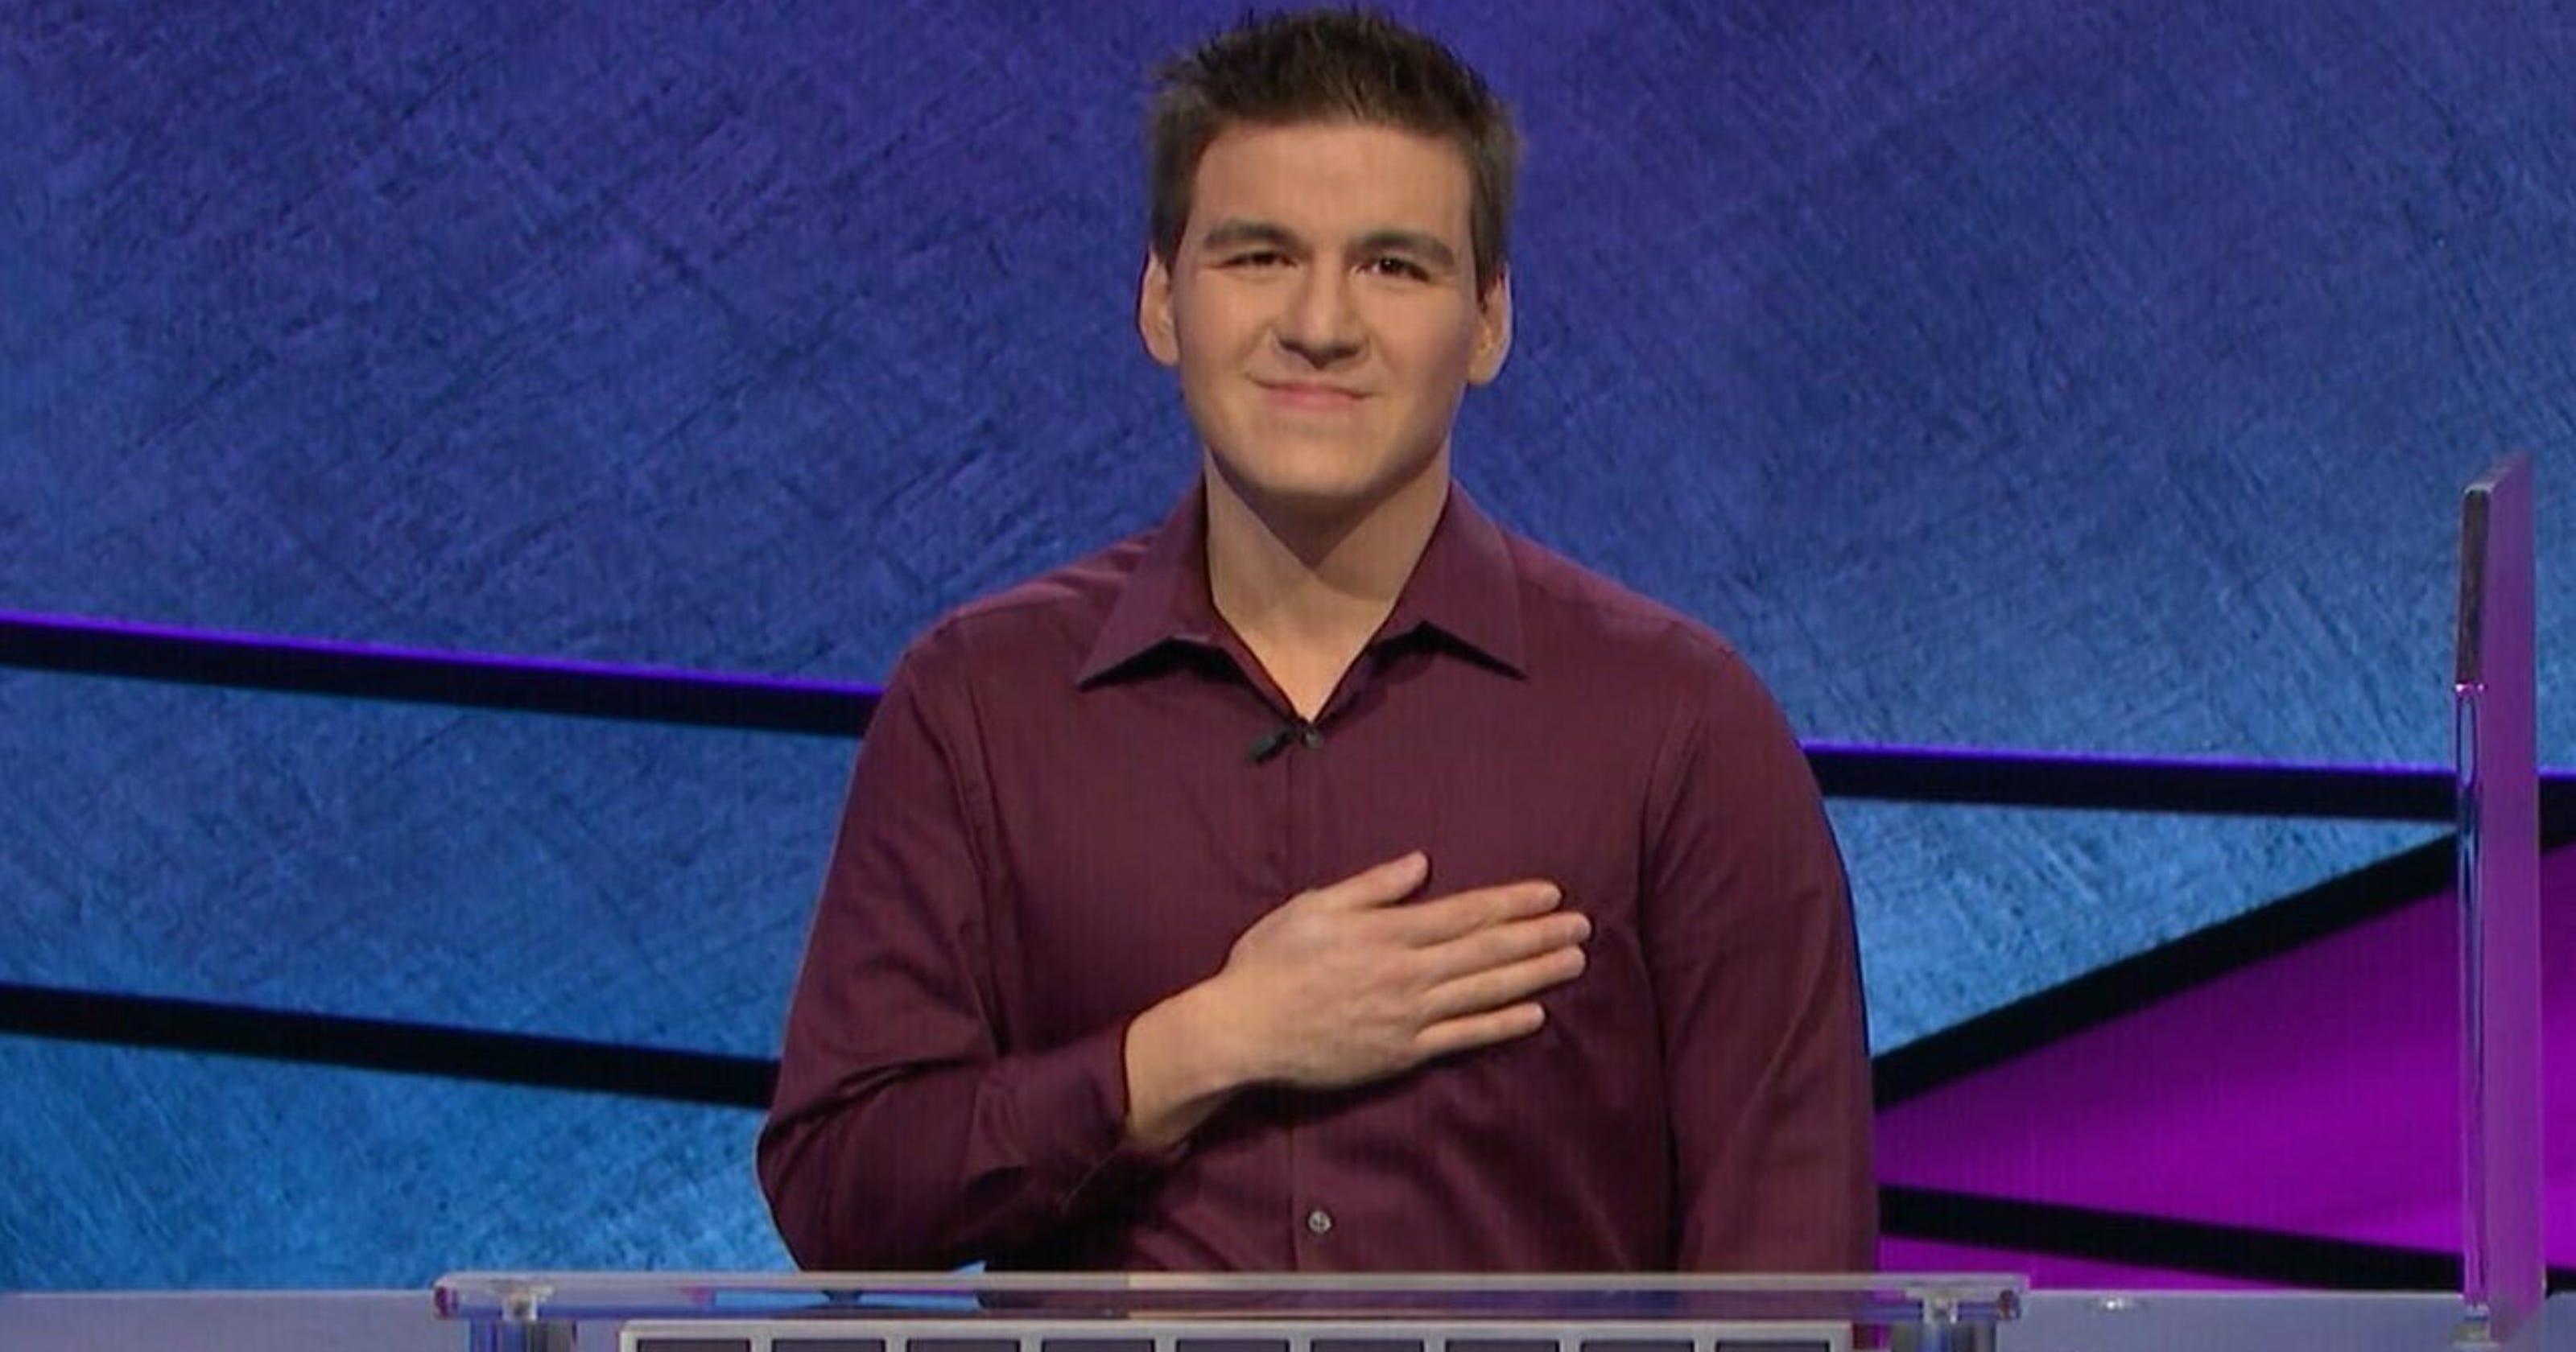 Jeopardy!': James Holzhauer hits $2 million mark, nears Ken Jennings